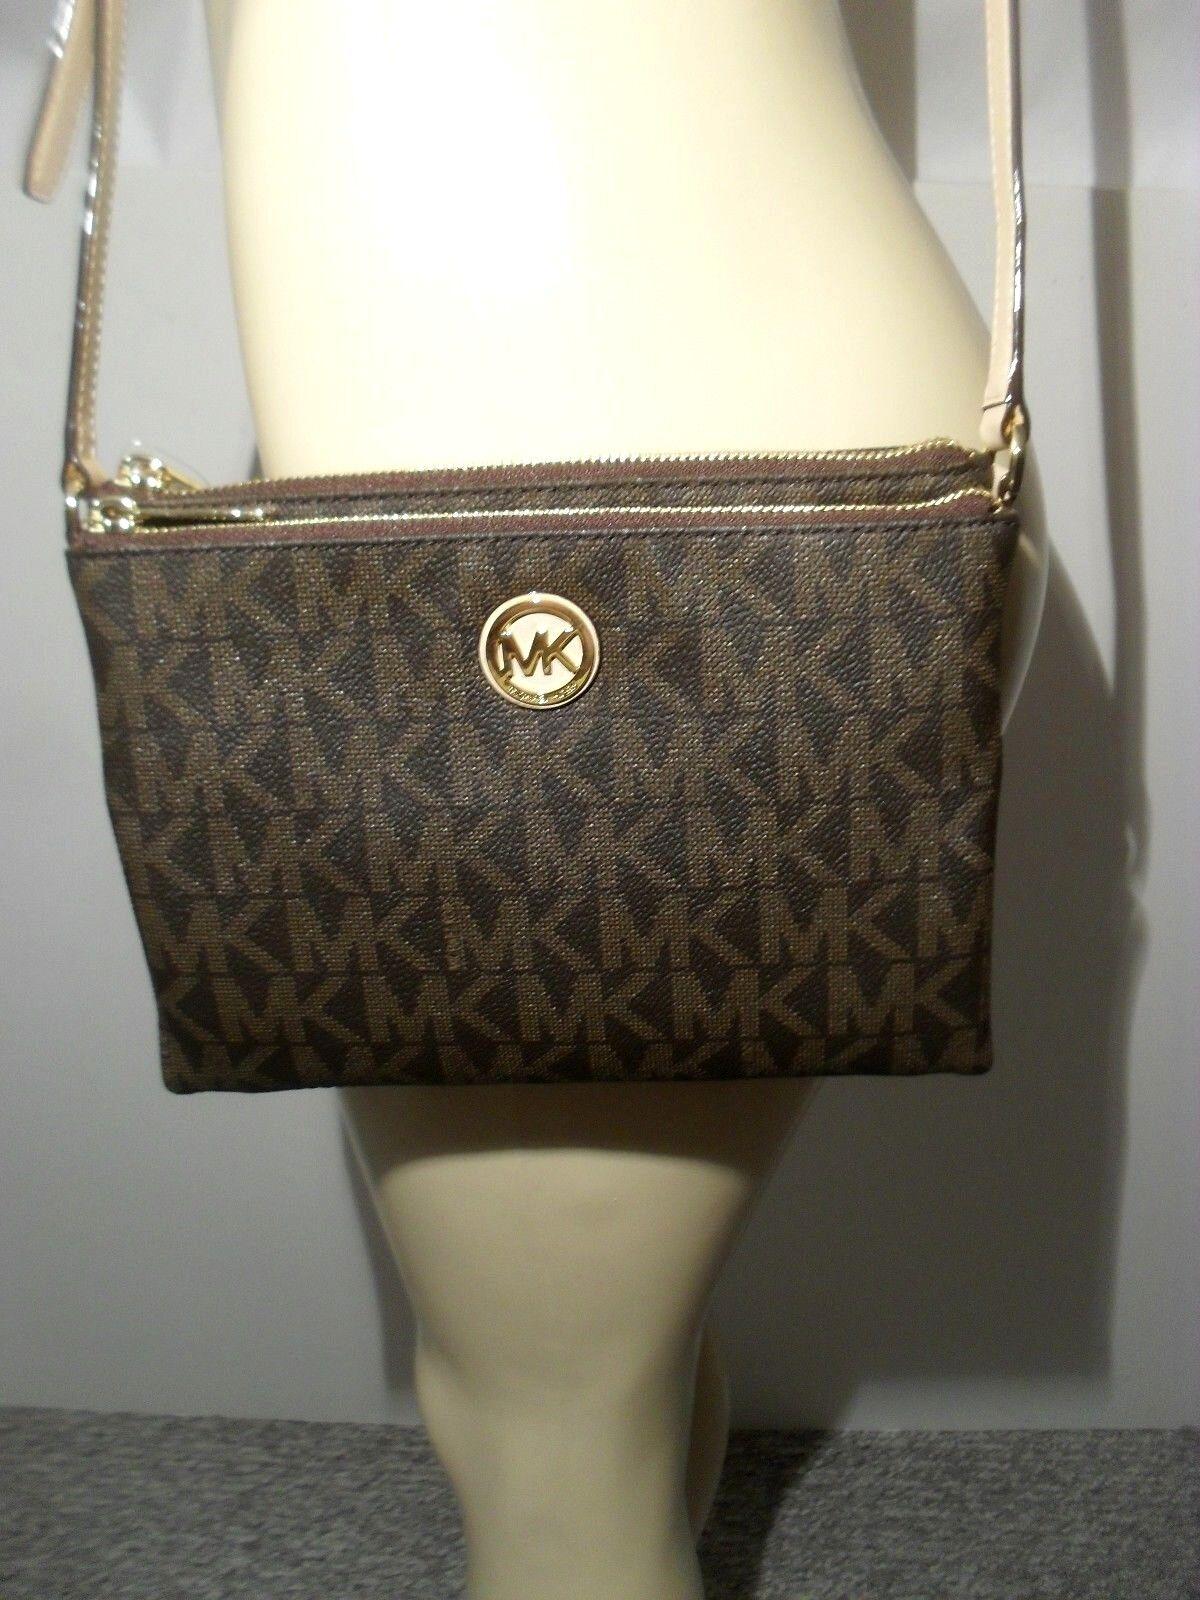 Michael Kors - NWT Michael Kors Brown Fulton Large EW Crossbody PVC Handbag MK Messenger Bag